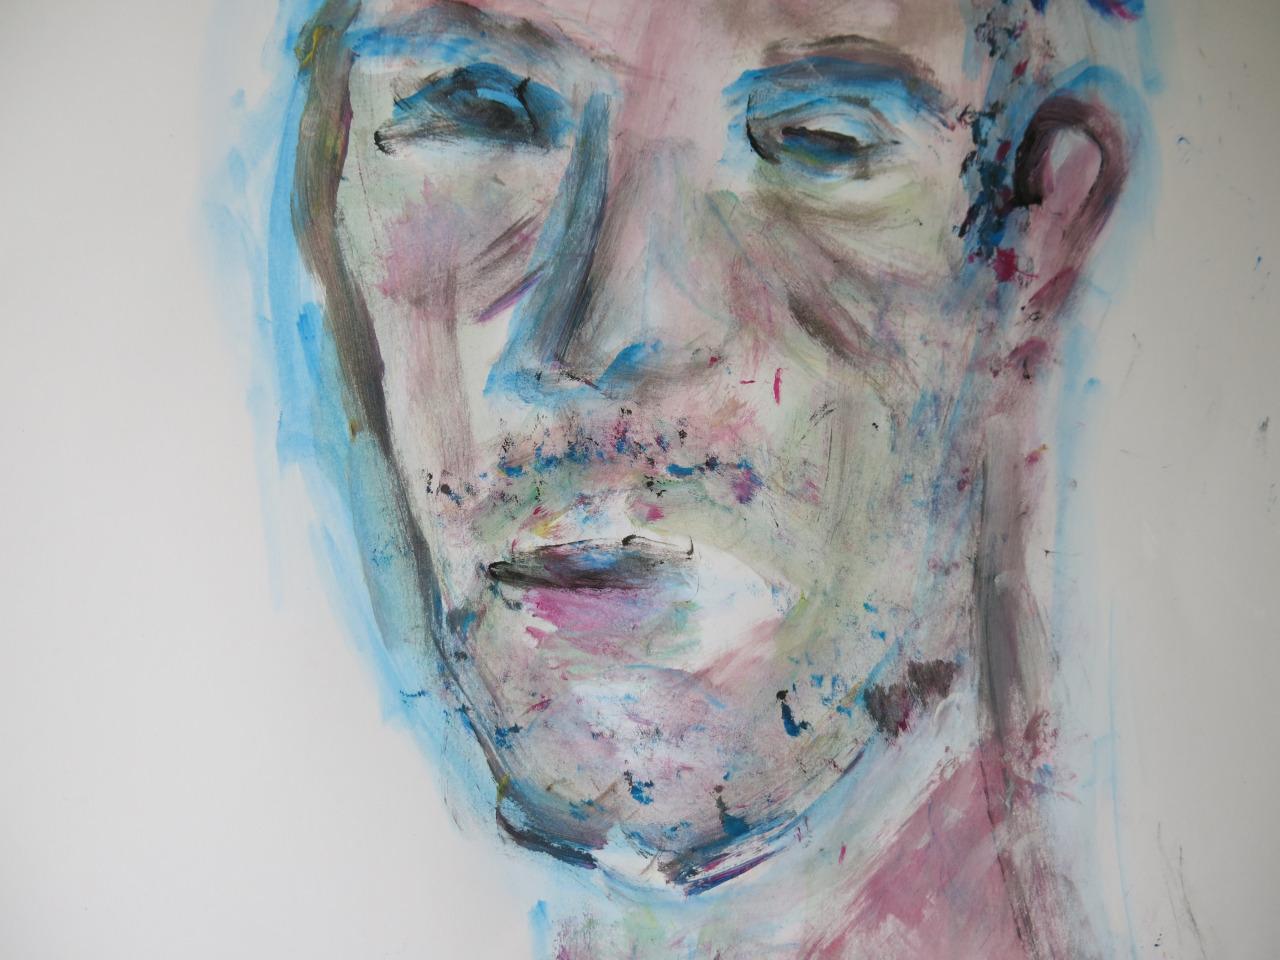 Urlich, Acryl auf Papier, 40x30 cm, 2013